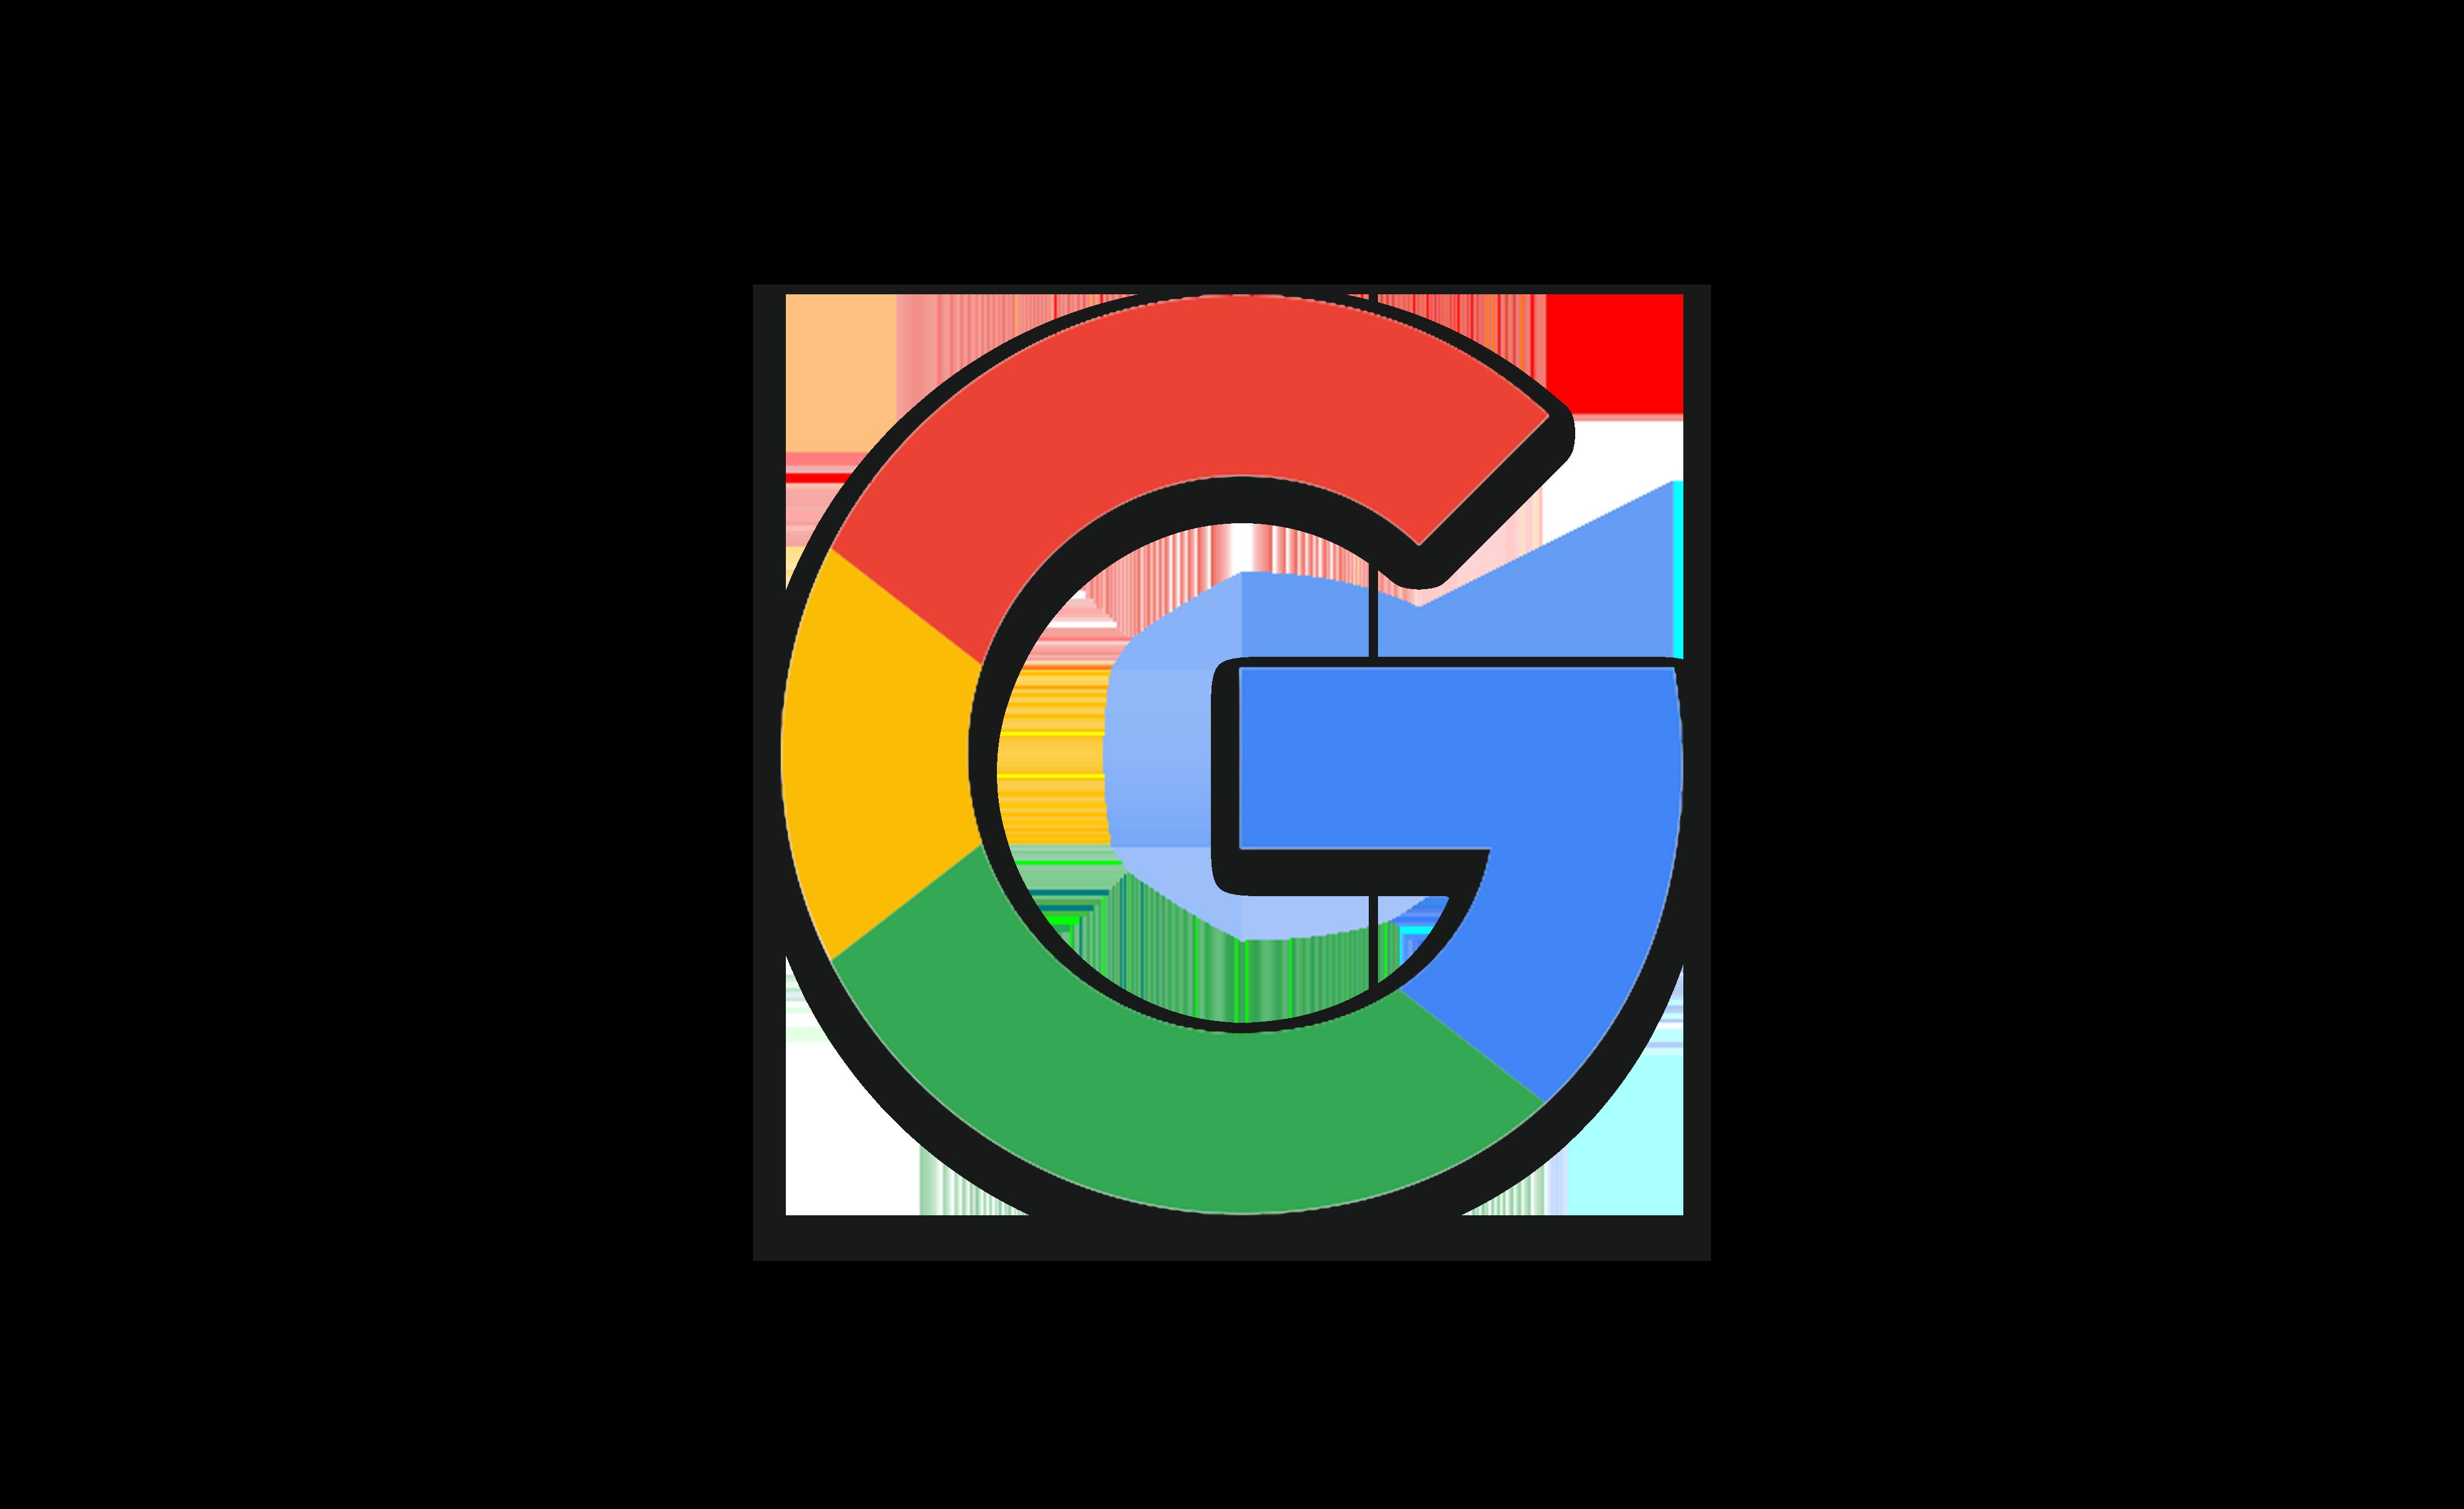 Example of favicon - Google icon